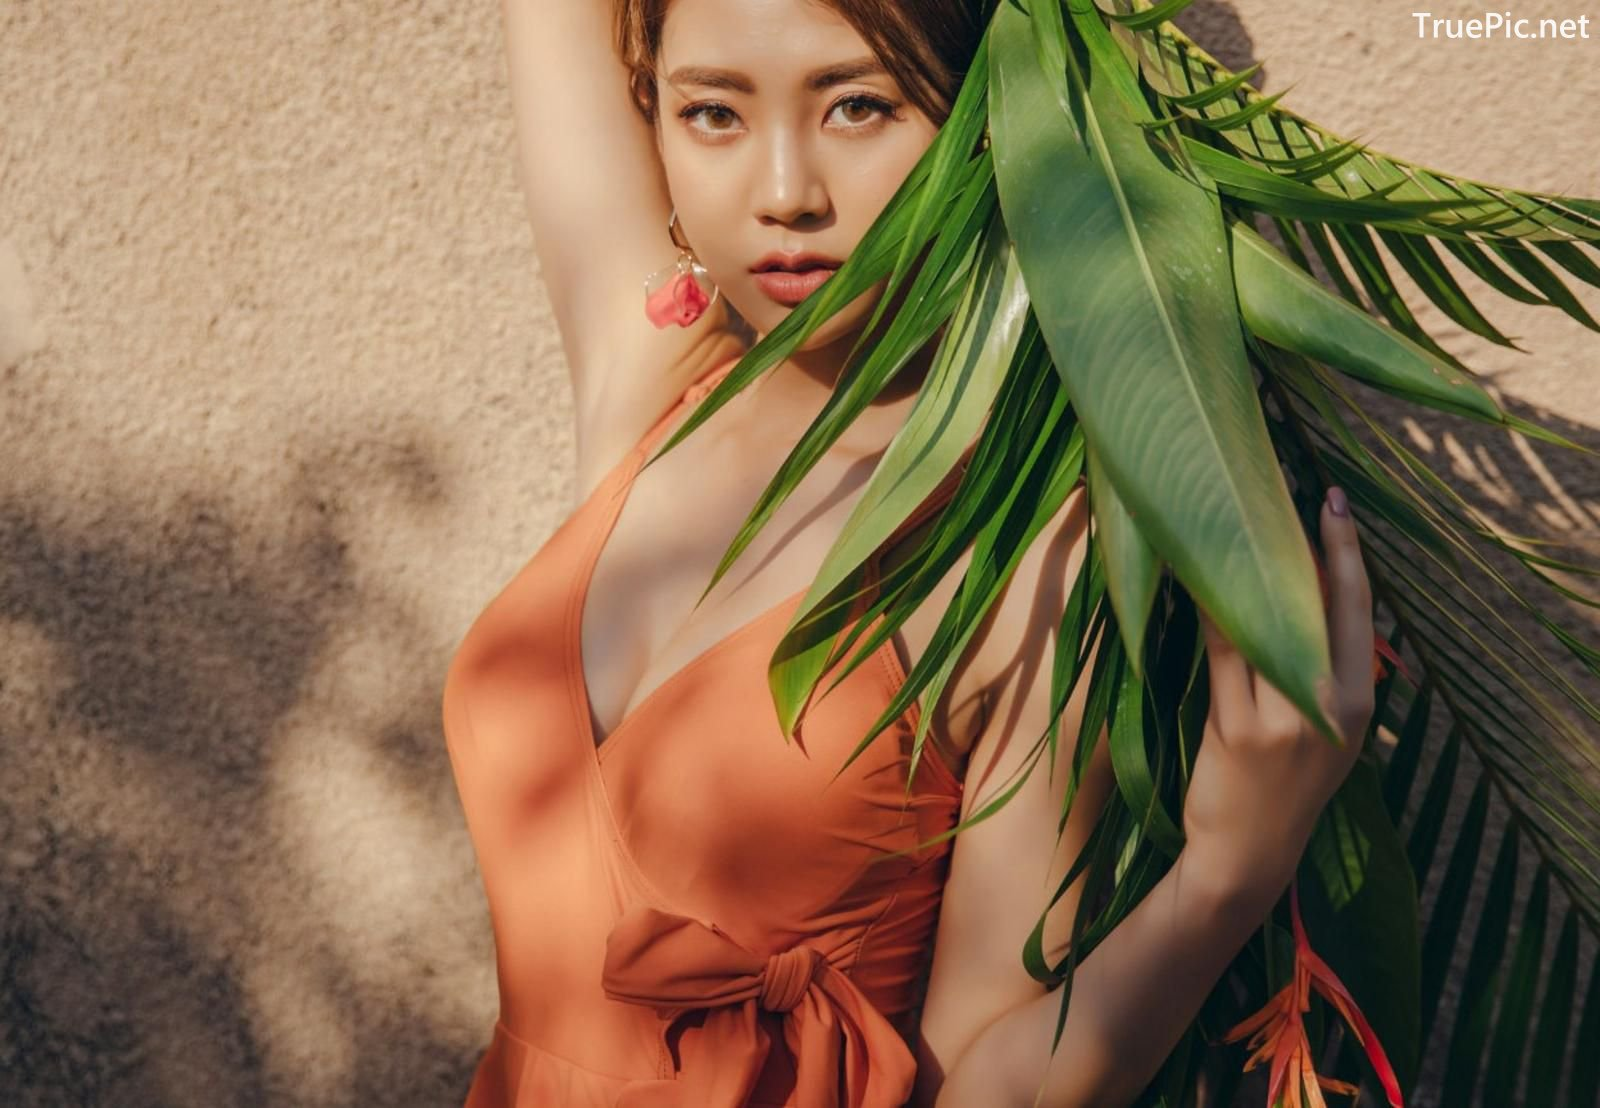 Image Korean Fashion Model - Lee Chae Eun - Sienna One Piece Swimsuit - TruePic.net - Picture-12